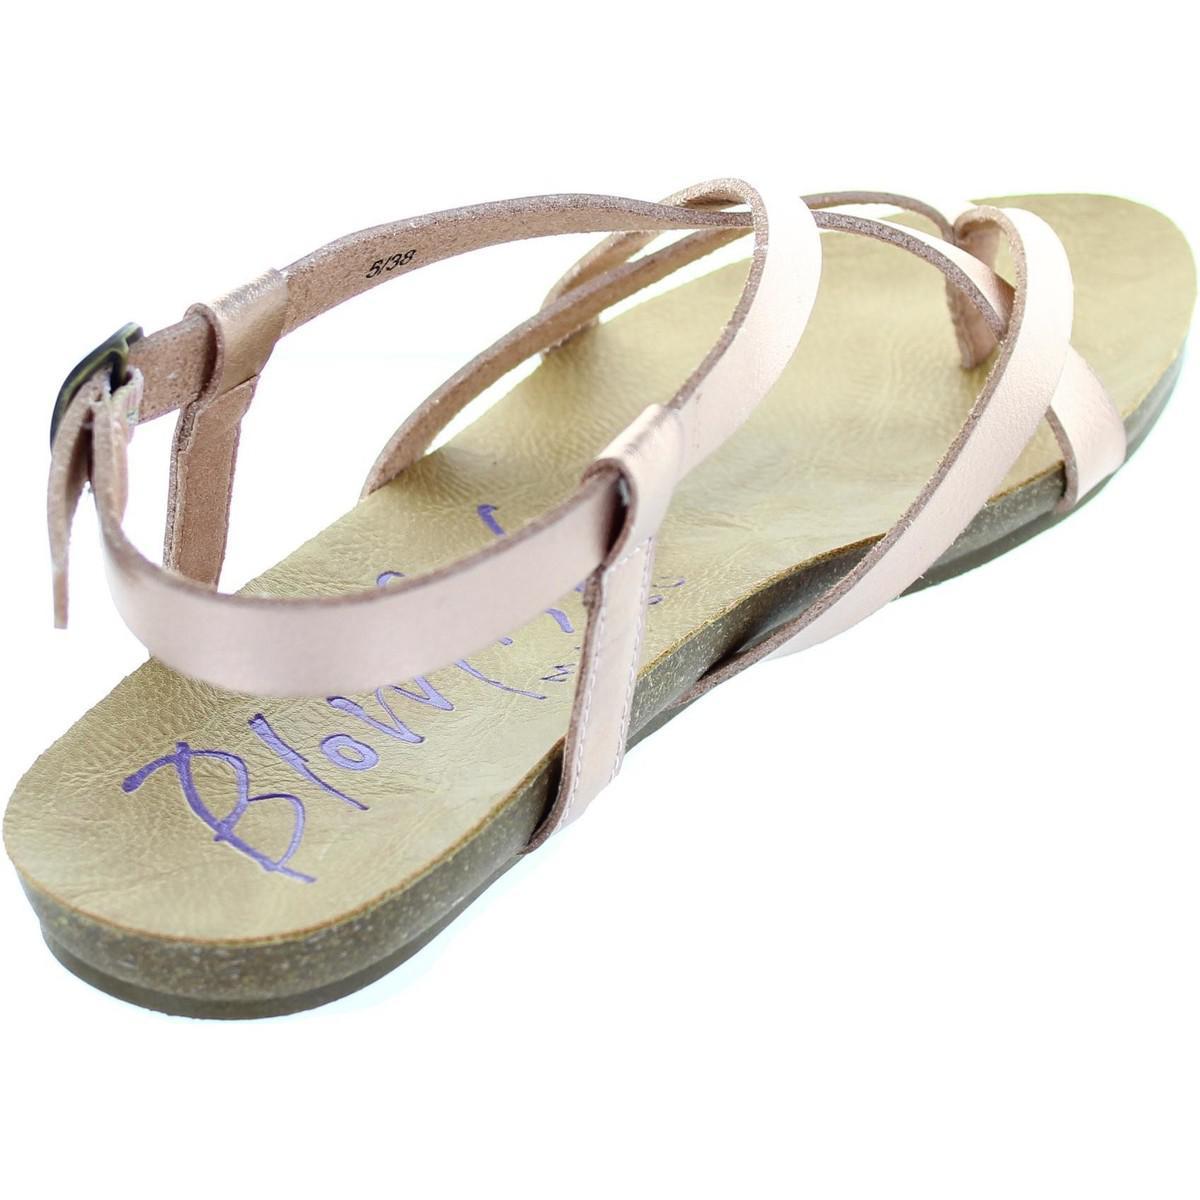 a261f899cf1 Blowfish Malibu Granola Women s Sandals In Gold in Metallic - Lyst